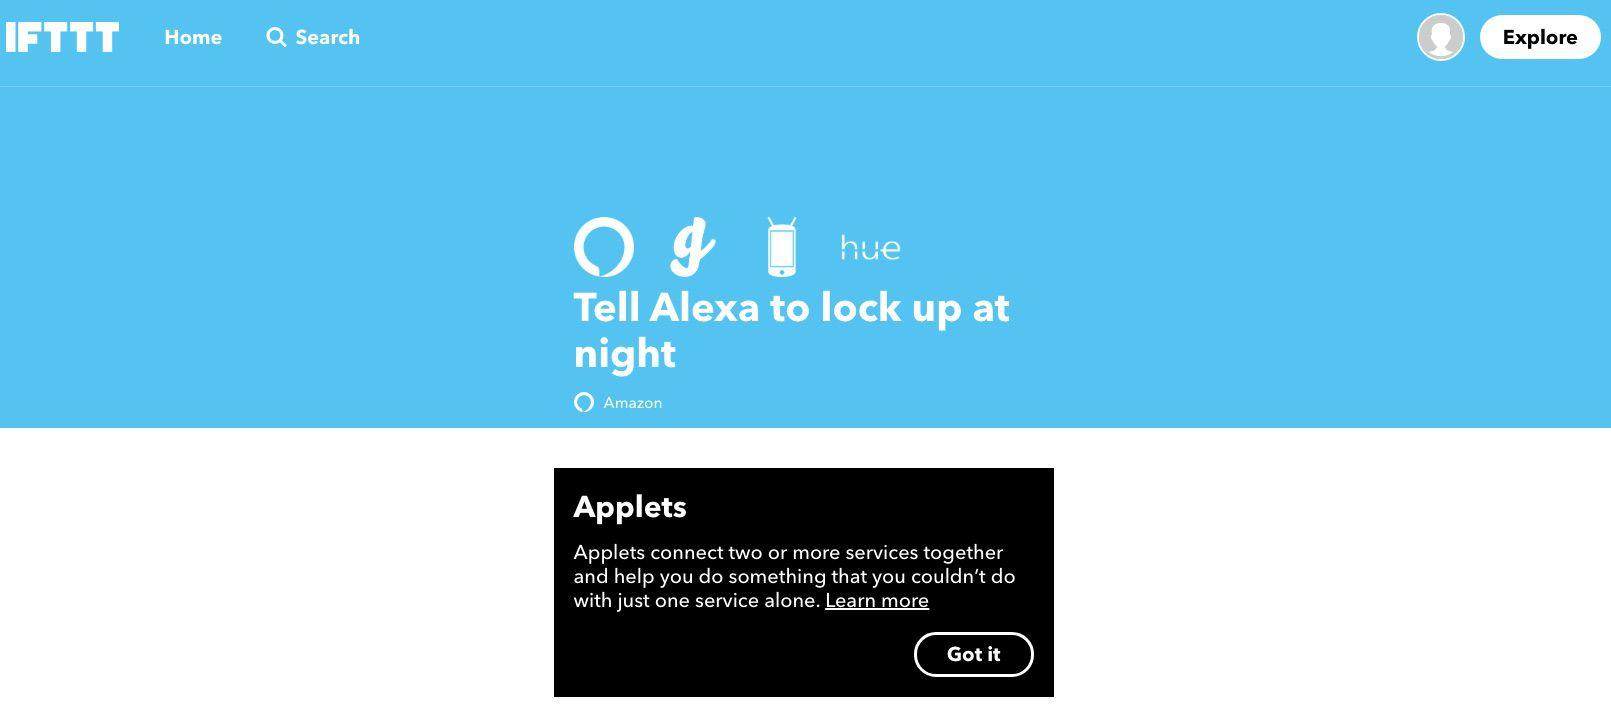 Screenshot of IFTTT App that tells Alexa to lock up at night.